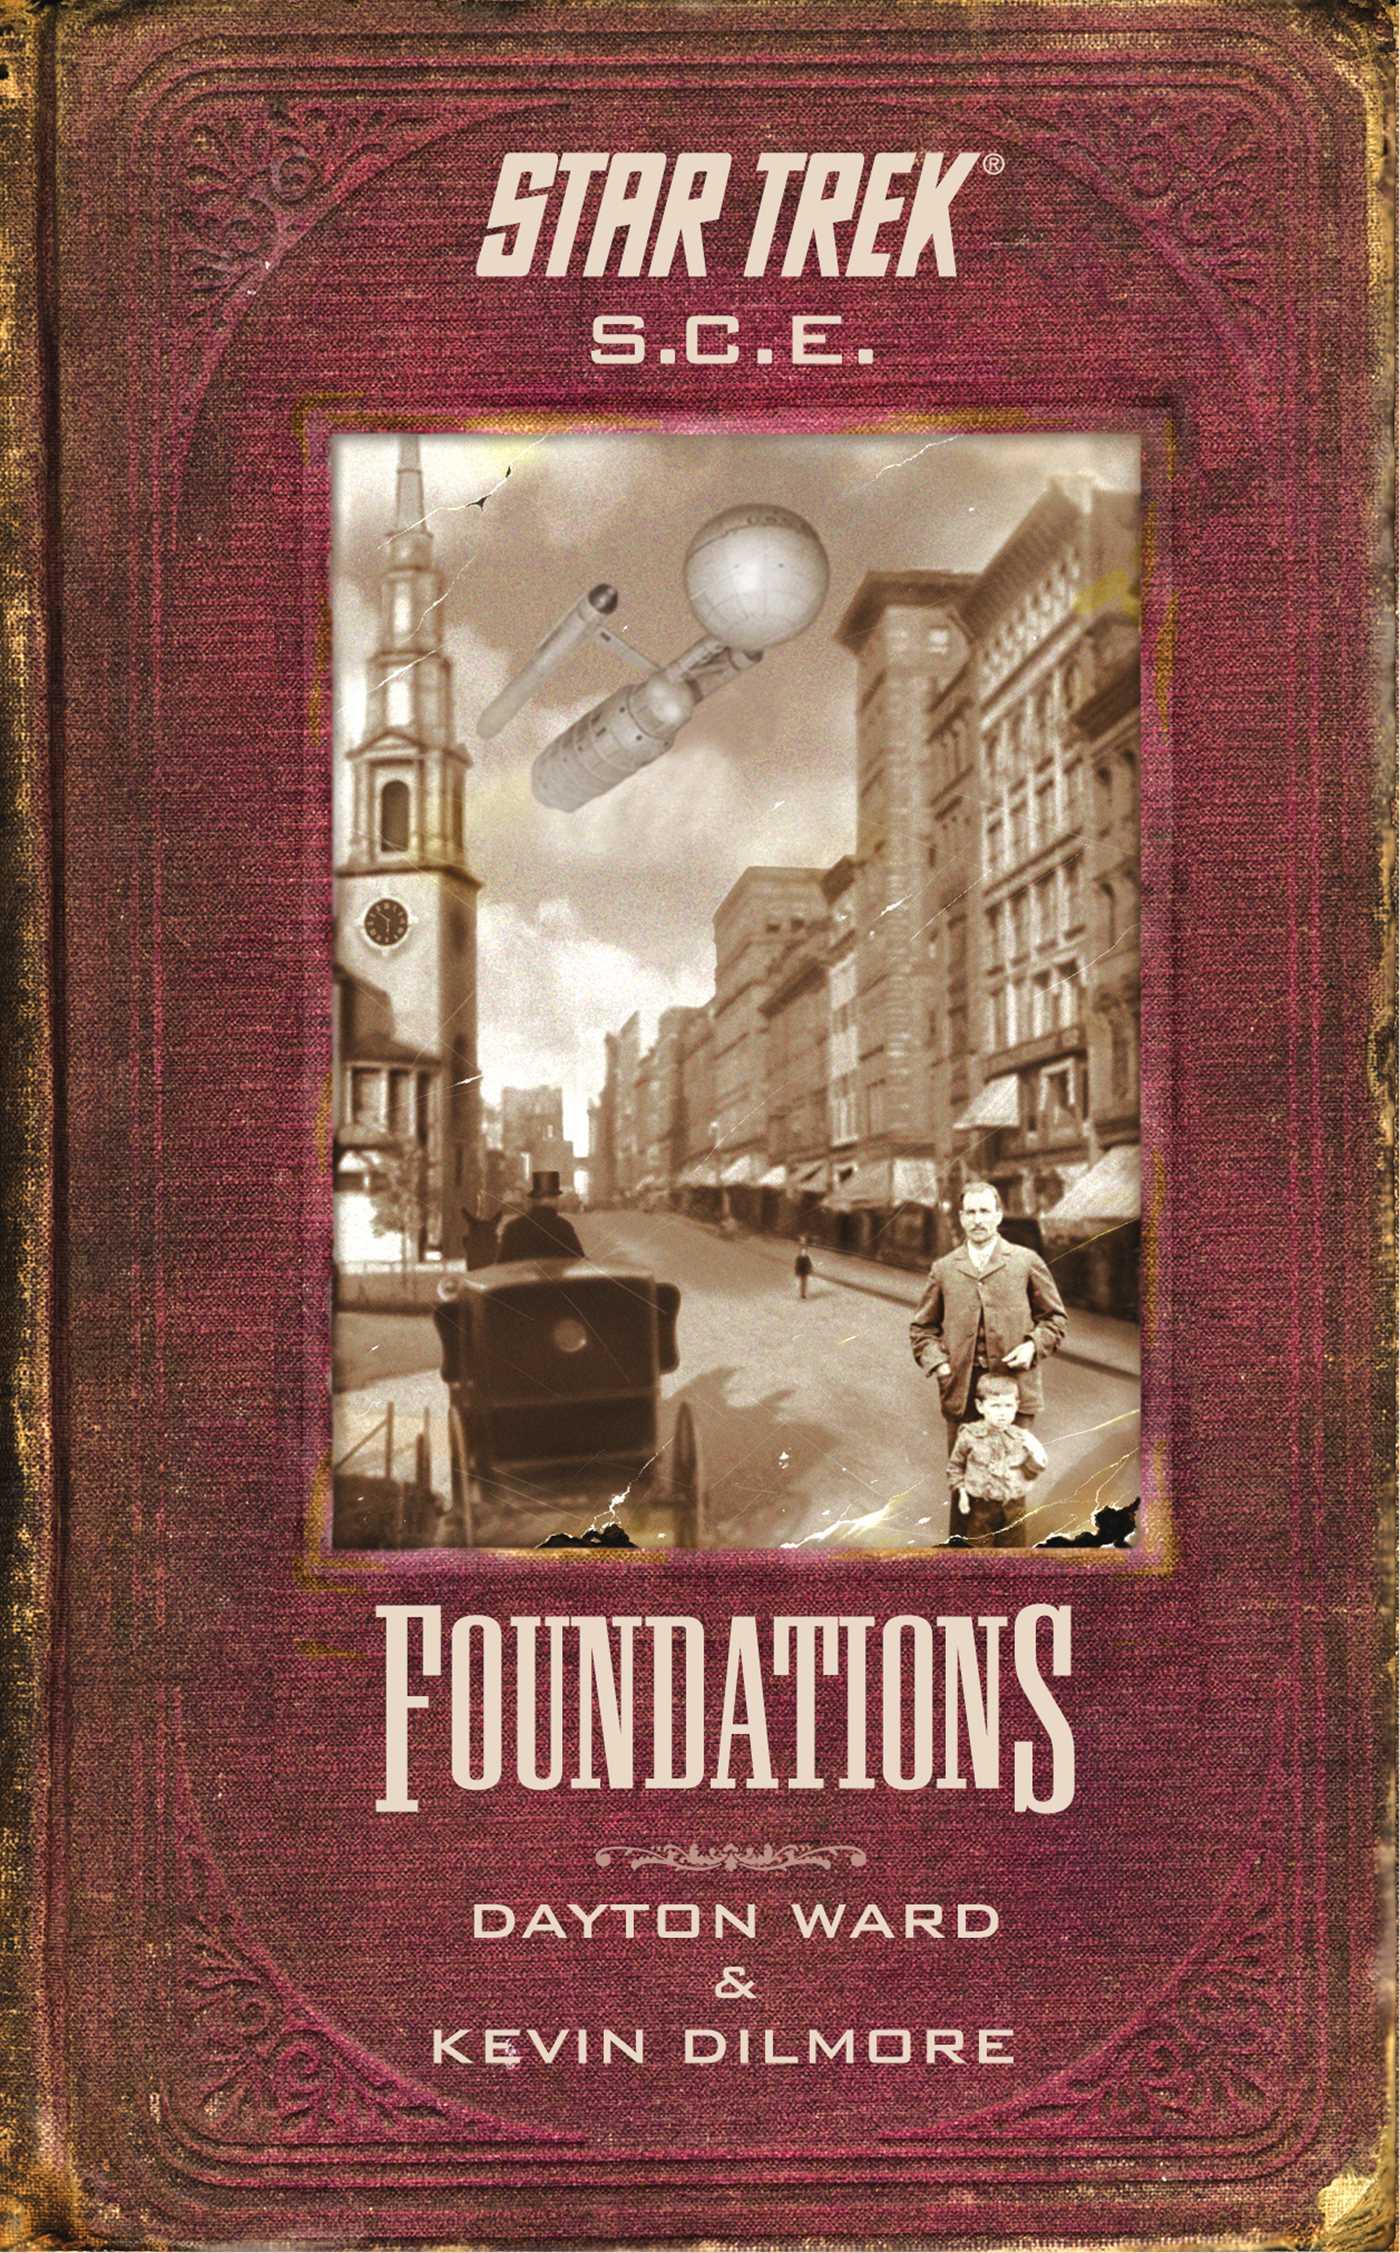 Star trek corps of engineers foundations 9780743489058 hr